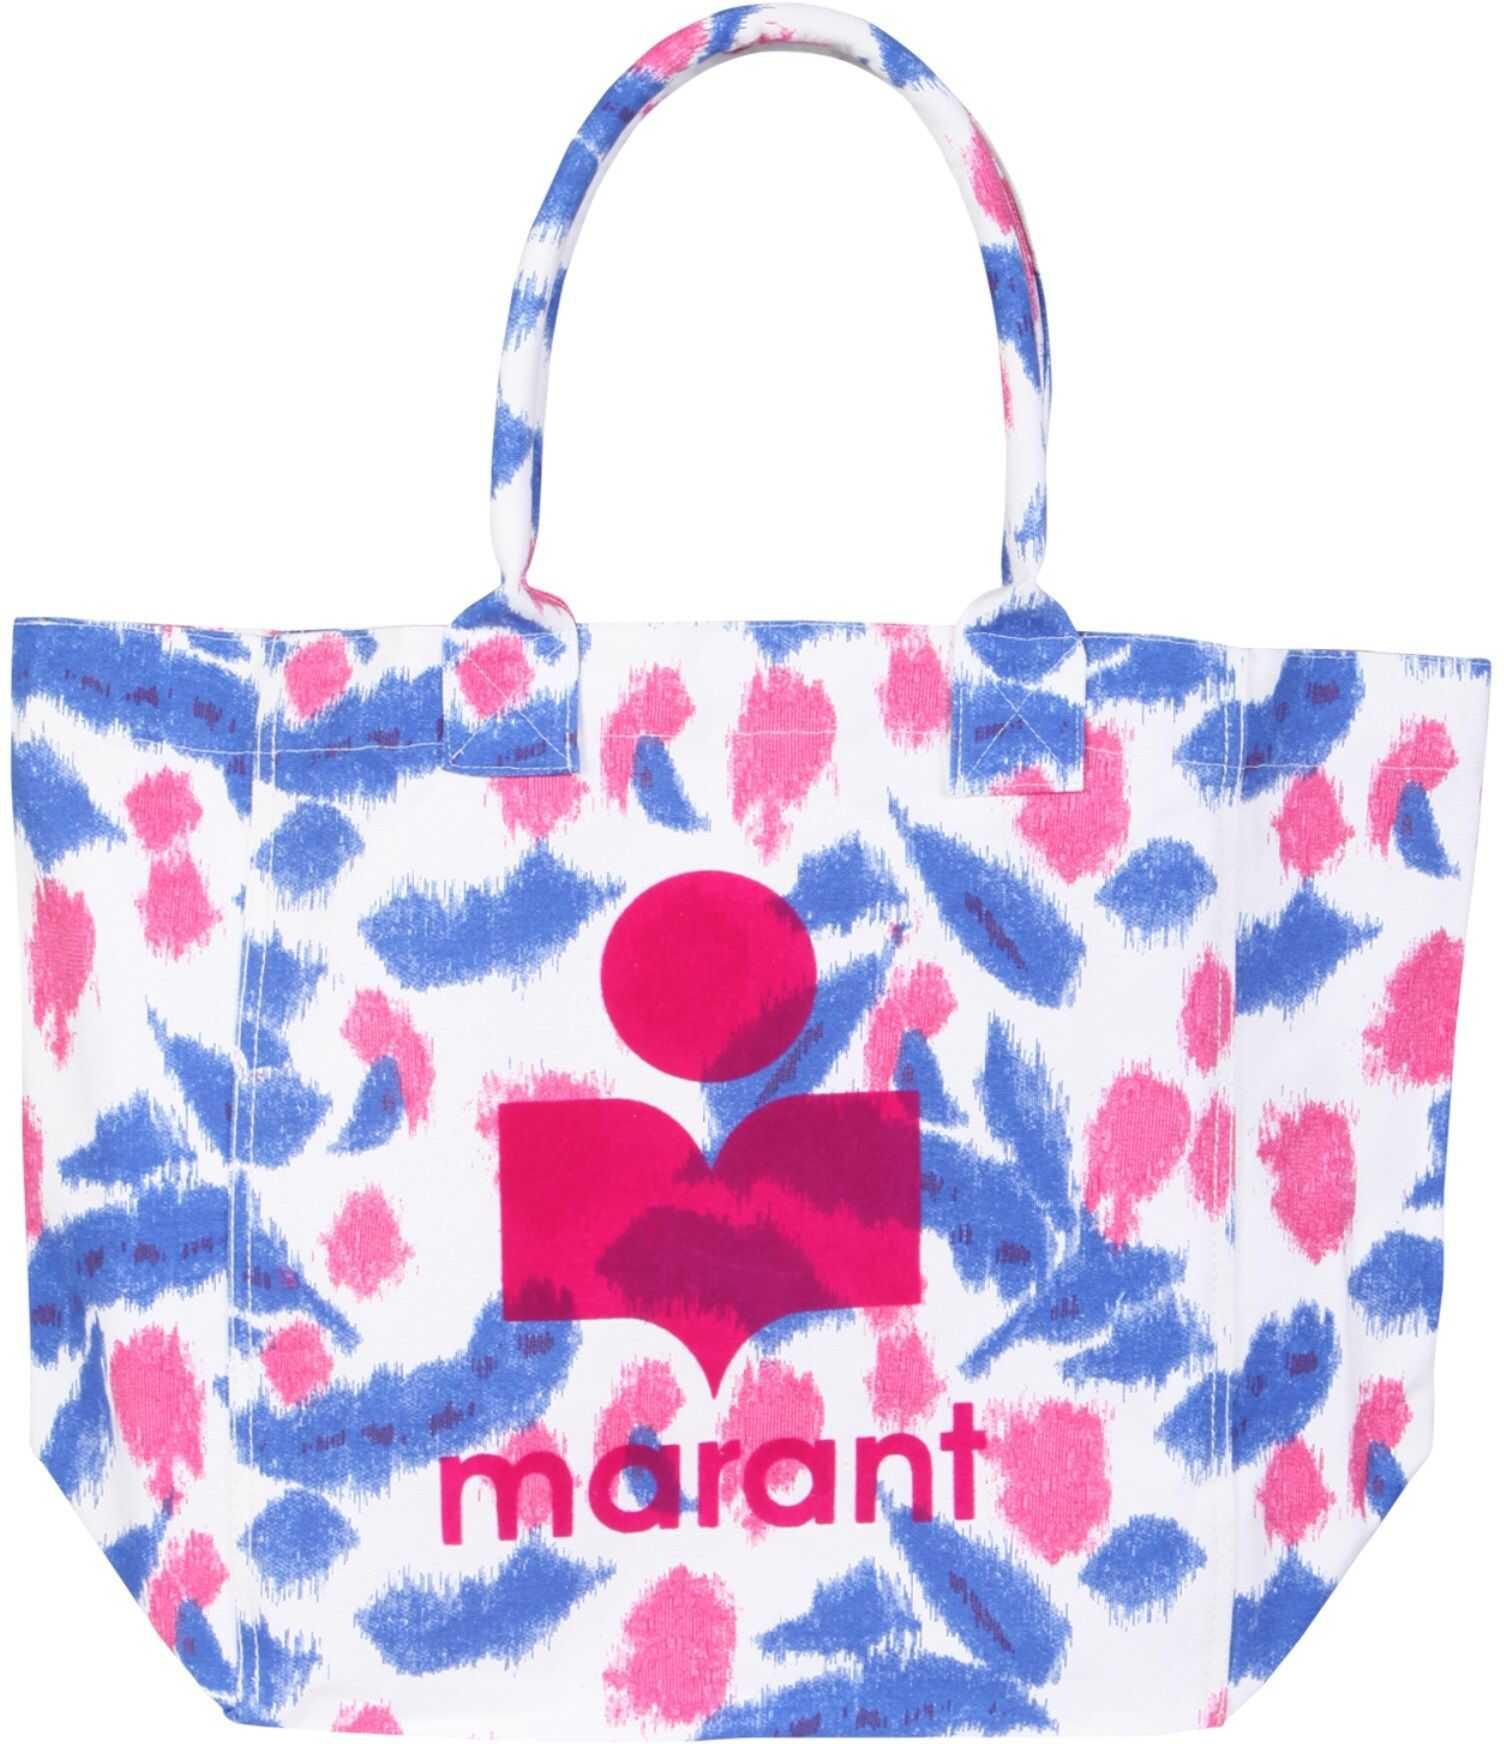 Isabel Marant Yenky Tote Bag PM0020_21E003M20WH MULTICOLOUR imagine b-mall.ro